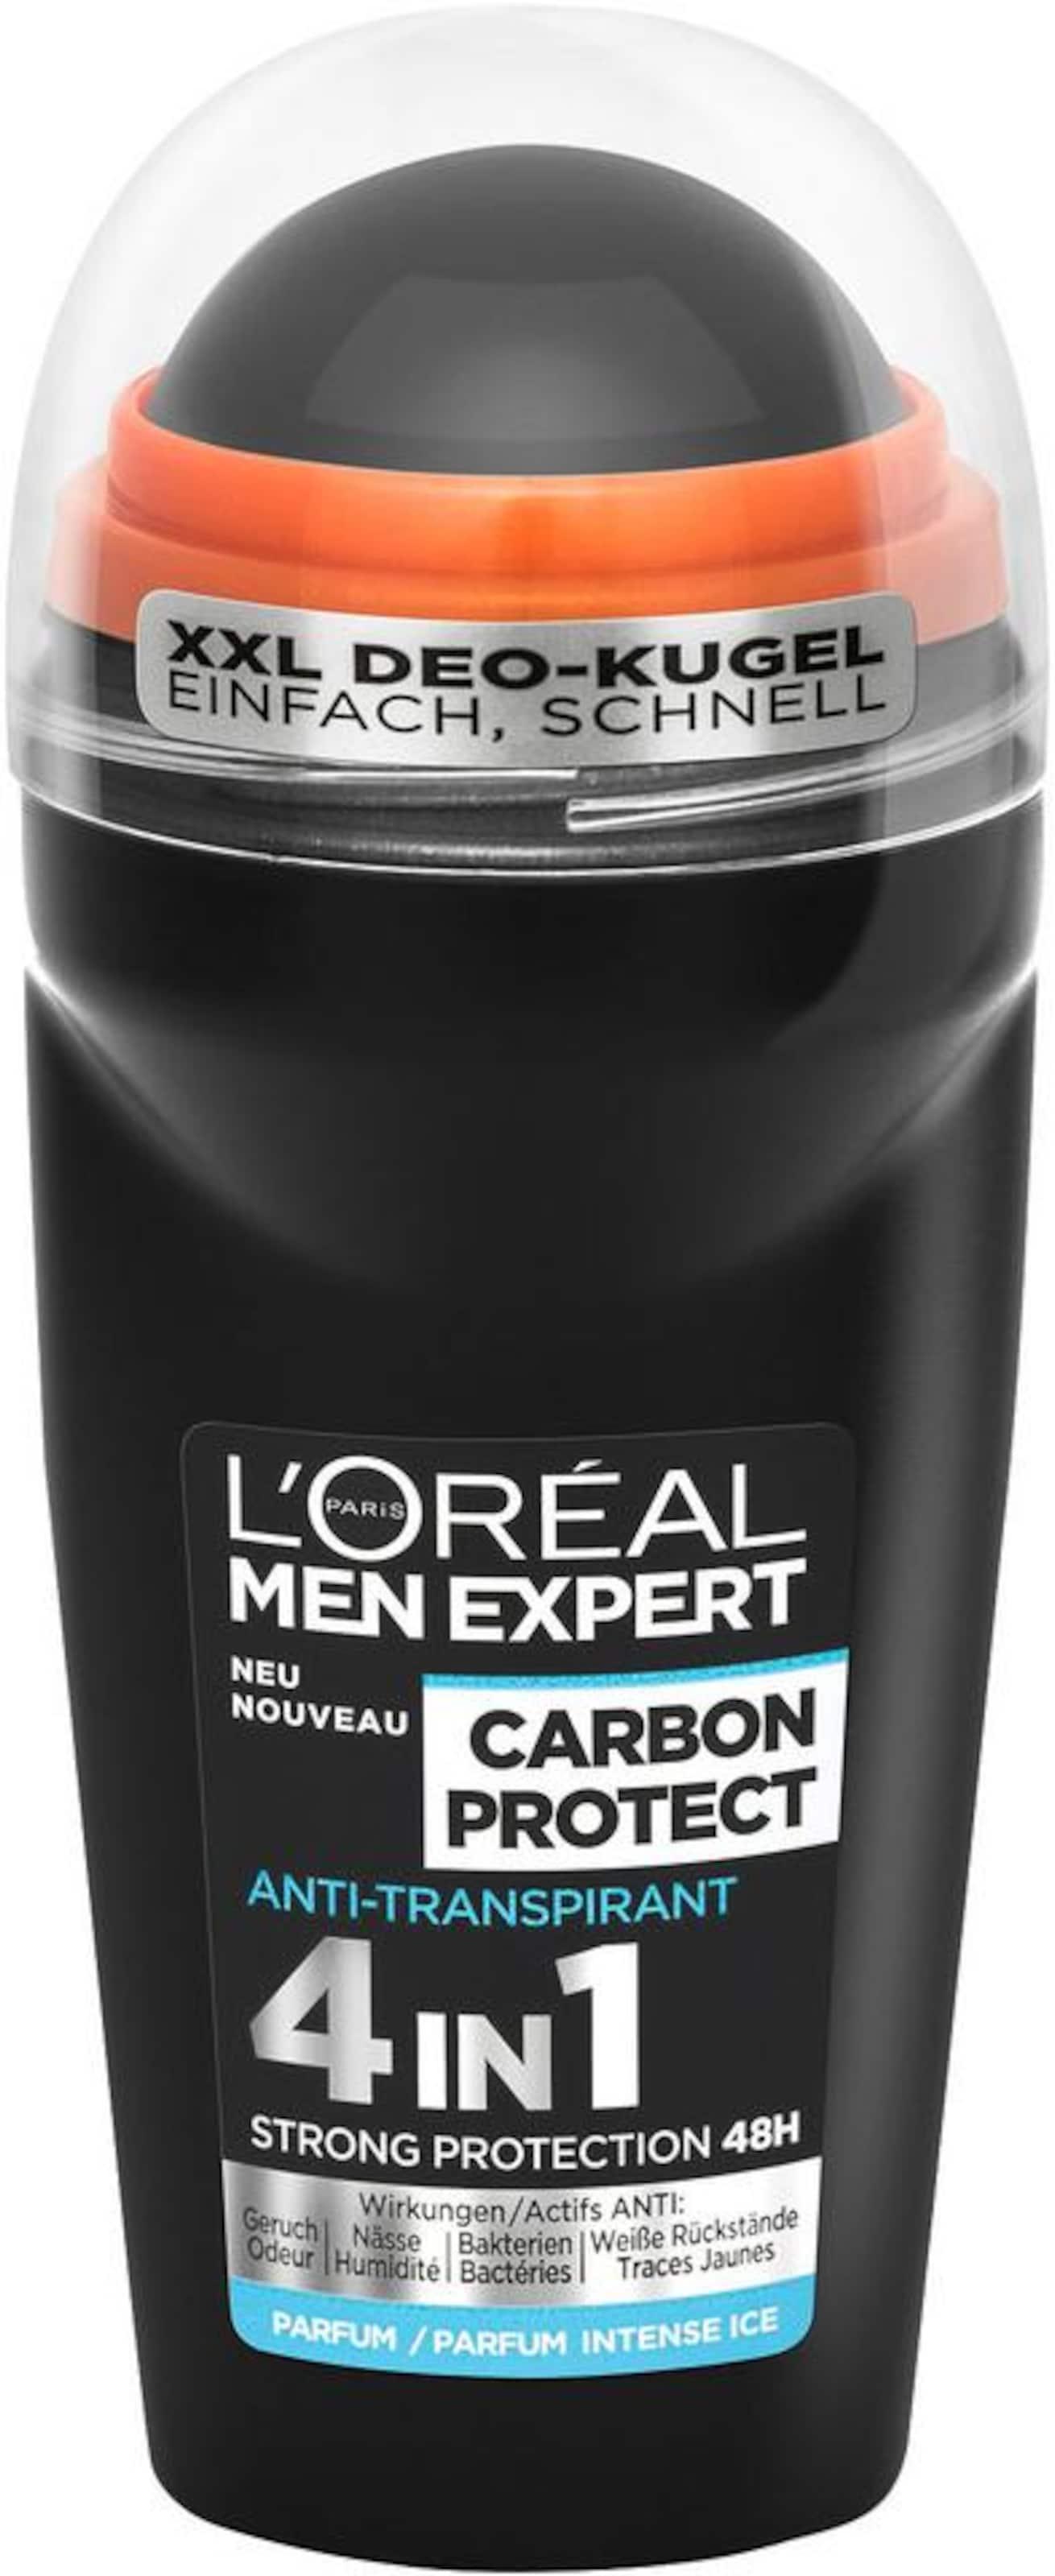 Schwarz L'oréal on Expert Men Paris In Roll Carbon ProtectDeo 543AqcLRj